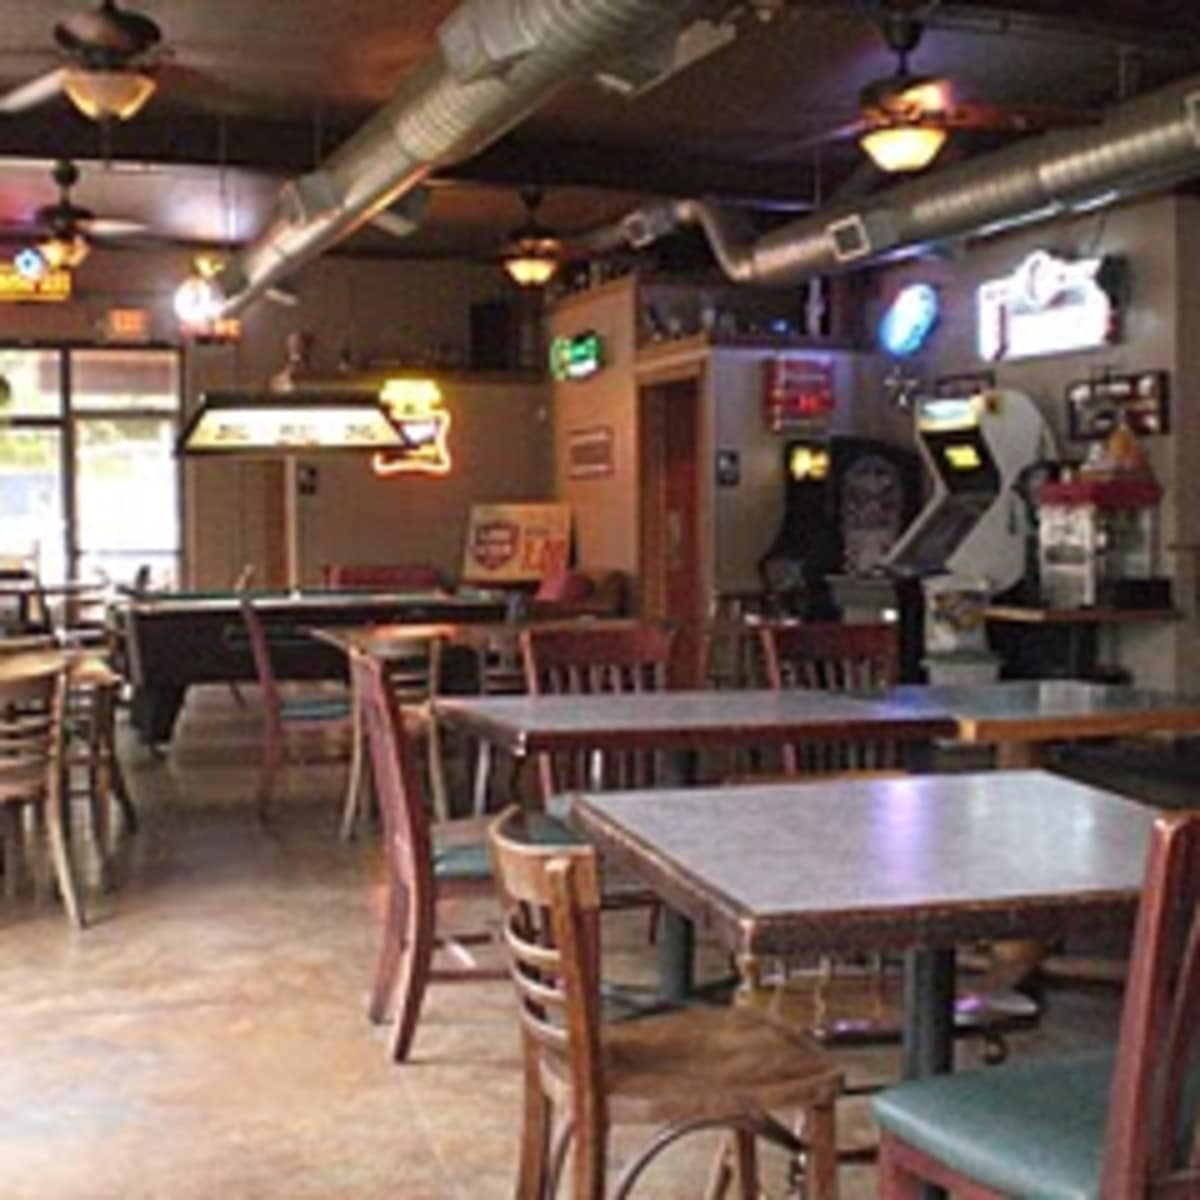 Austin_photo: places_drinks_barton springs saloon_inside